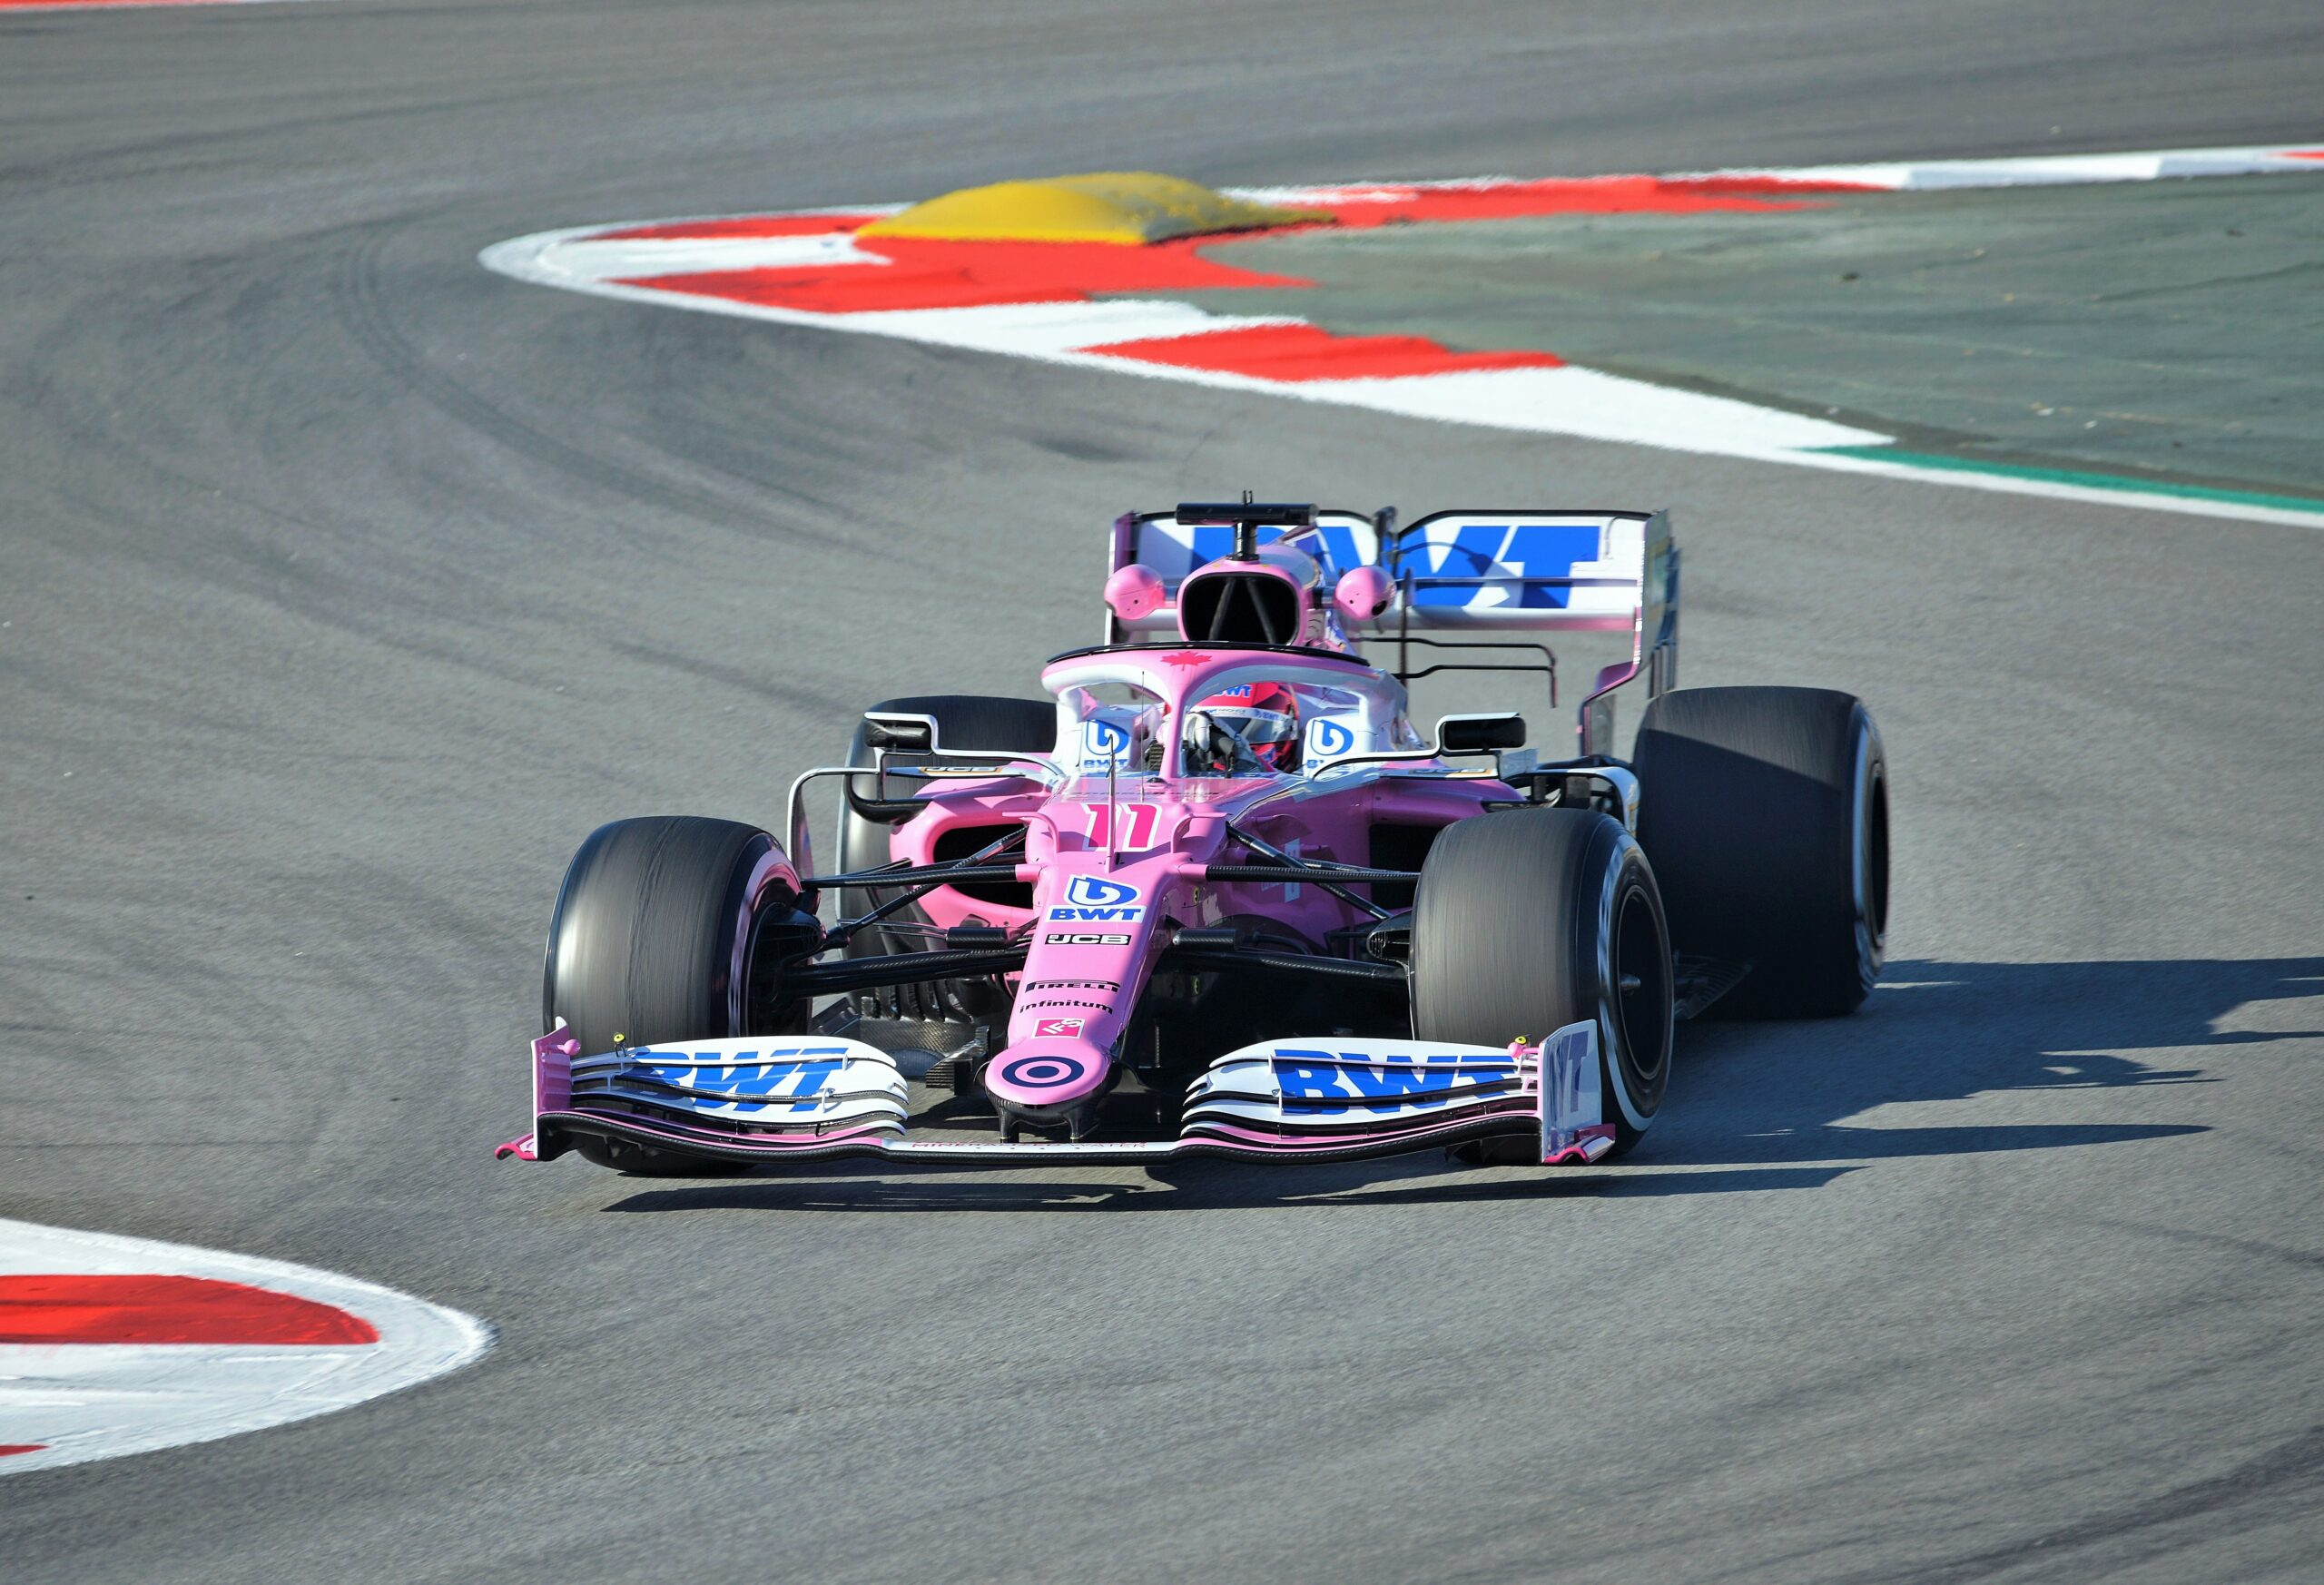 Formule 1 GP Mexico – 5***** Premium Hotelovernachtingen – Autódromo Hermanos Rodríguez 2021